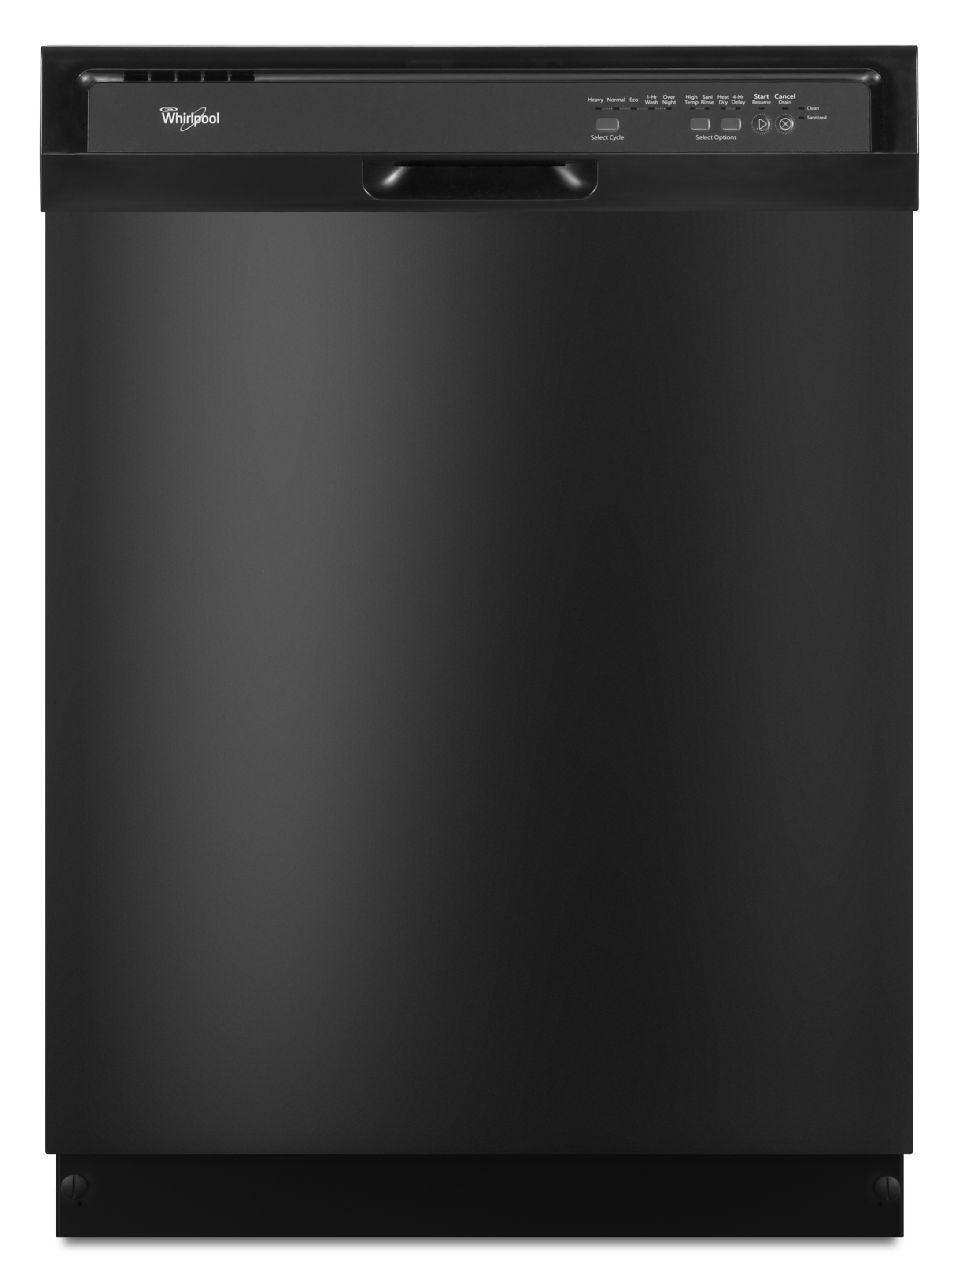 Whirlpool Dishwasher Model WDF510PAYB8 Parts